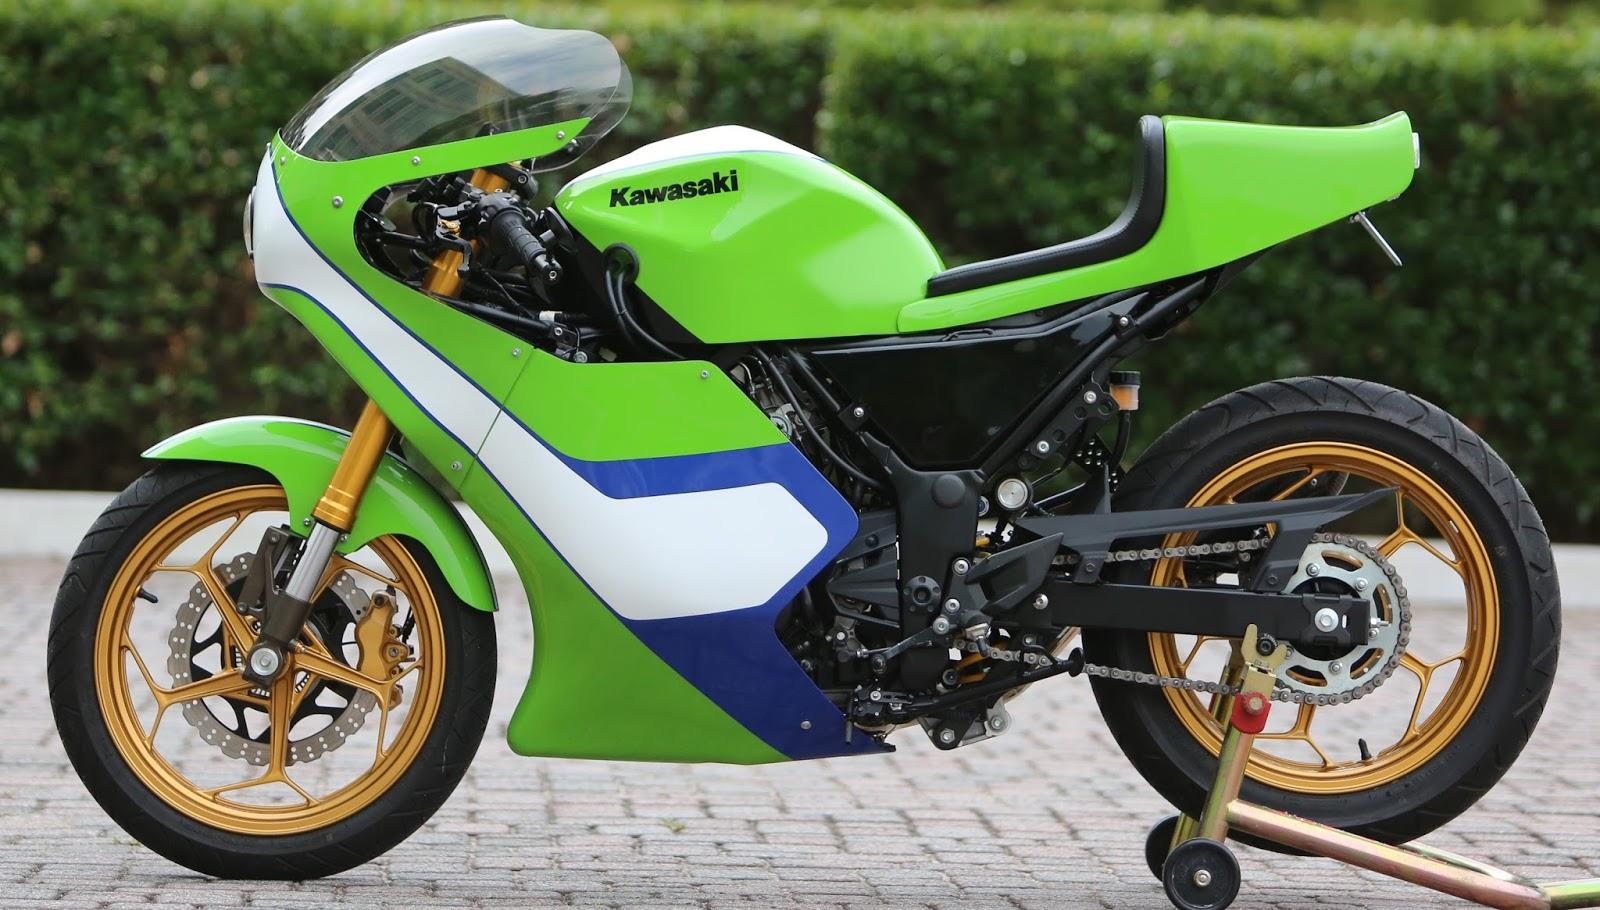 Kawasaki 300 Ninja H2 Gary Nixon Race Bike Replica 99garage